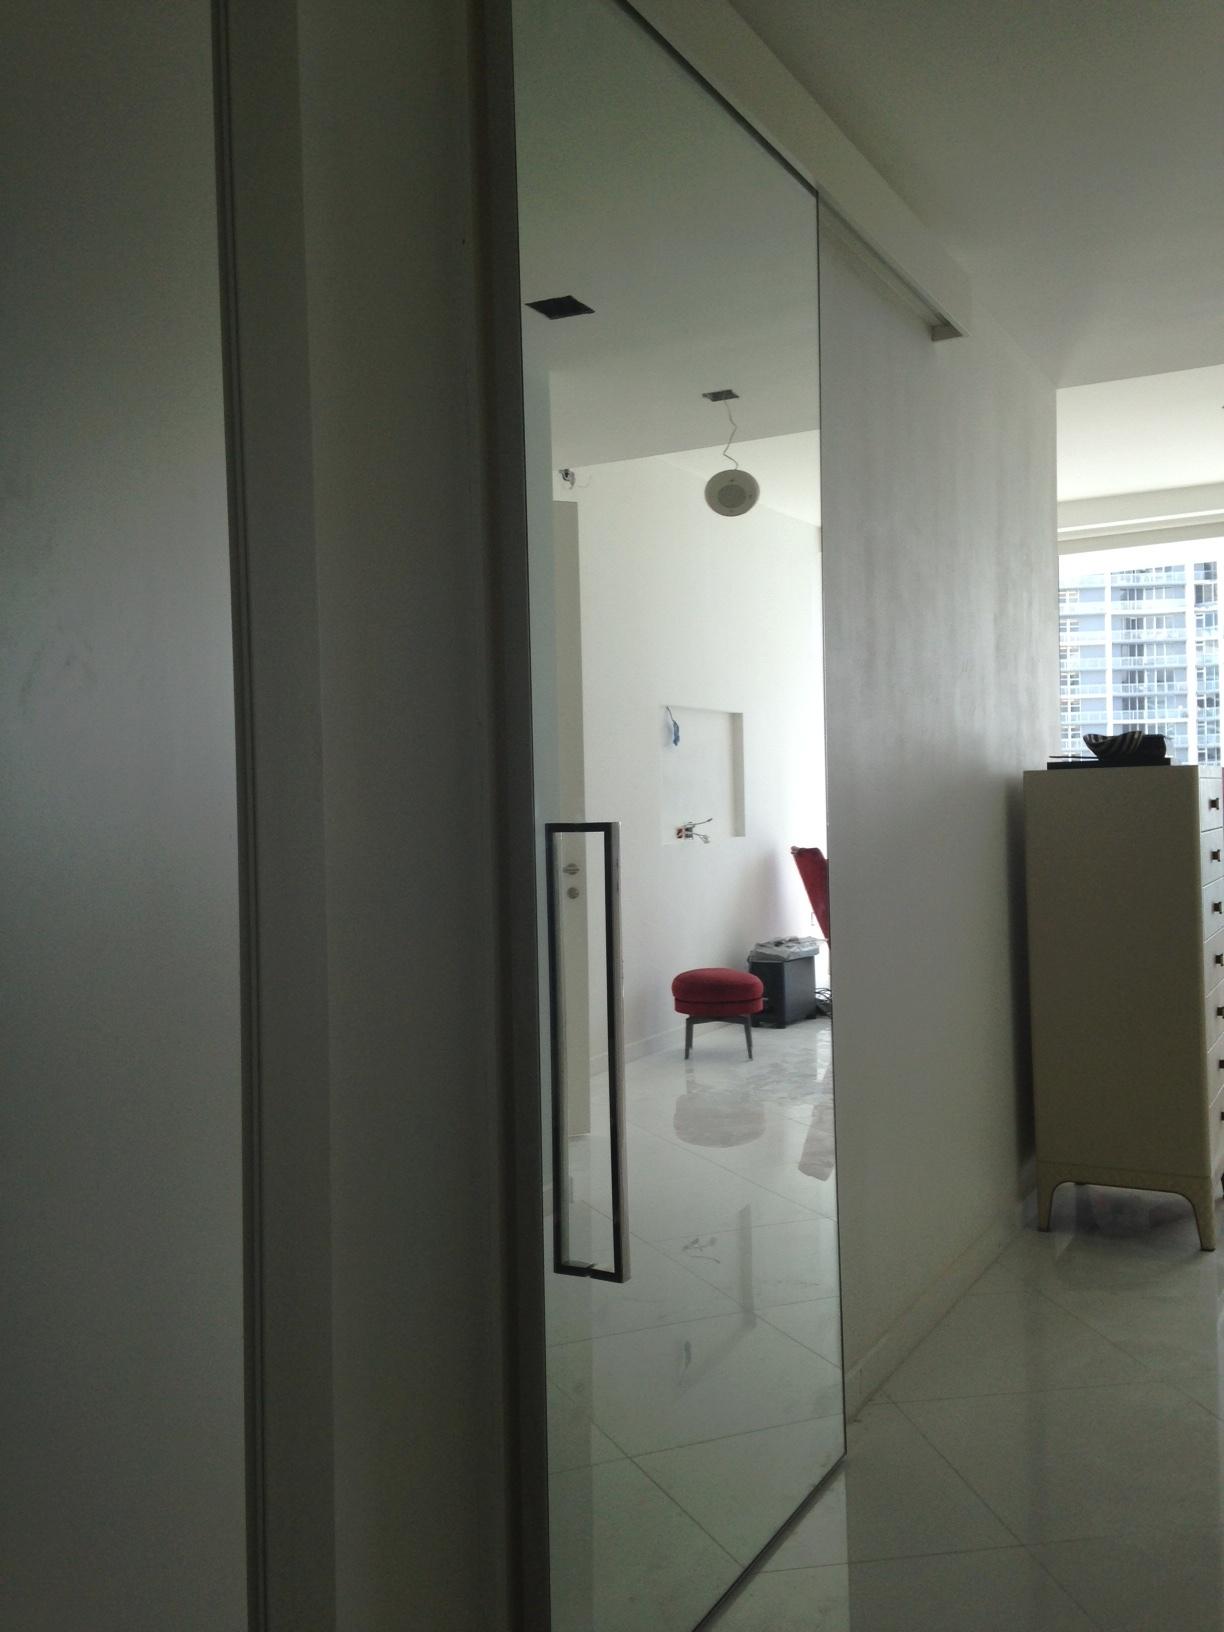 Panels-And-Doors-36.jpg